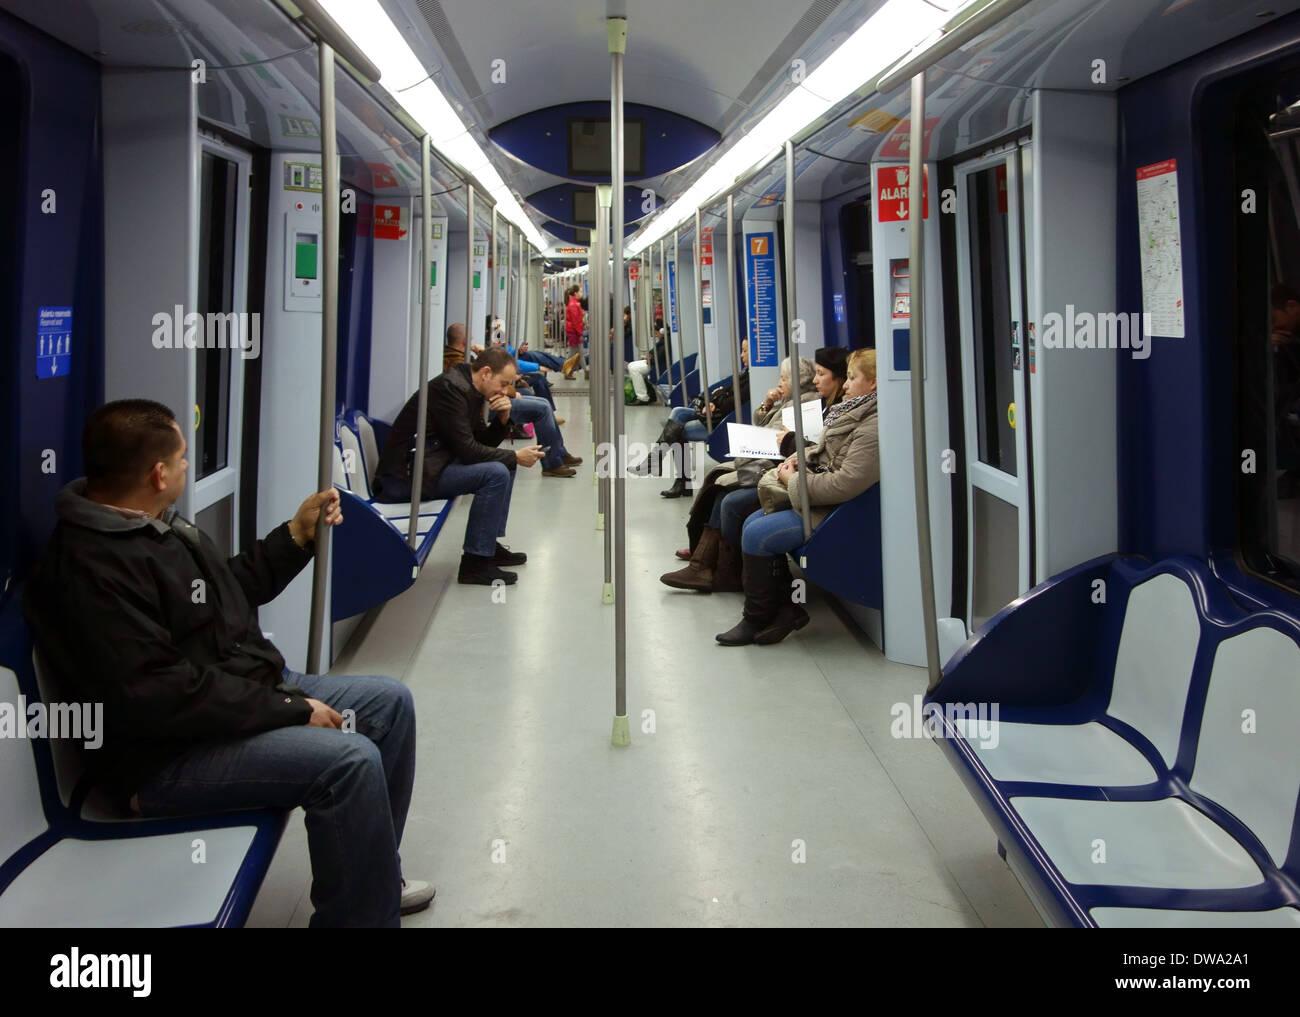 Interior of metro train carriage in madrid spain stock photo royalty free image 67218873 alamy - Carrage metro ...